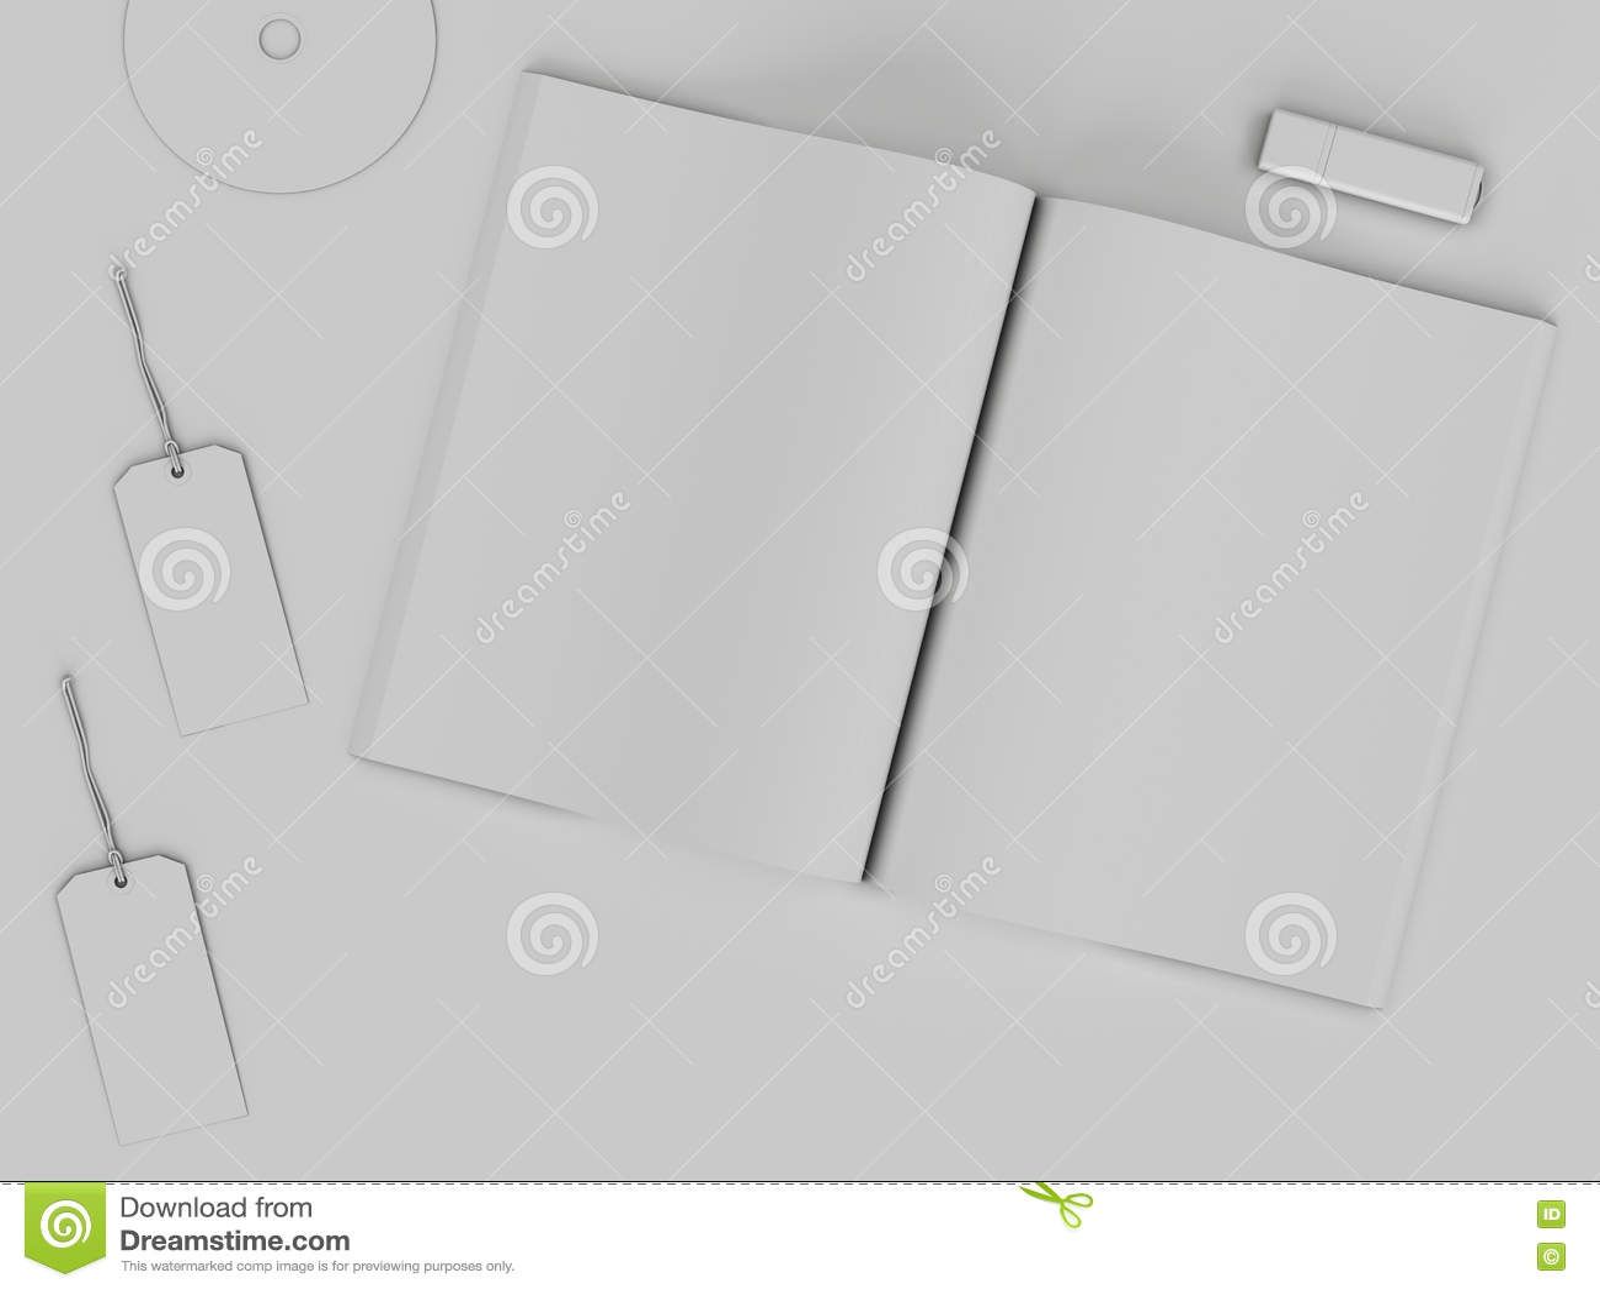 Branding Mockup Template White Set On Background 3d Rendering 3D Illustration